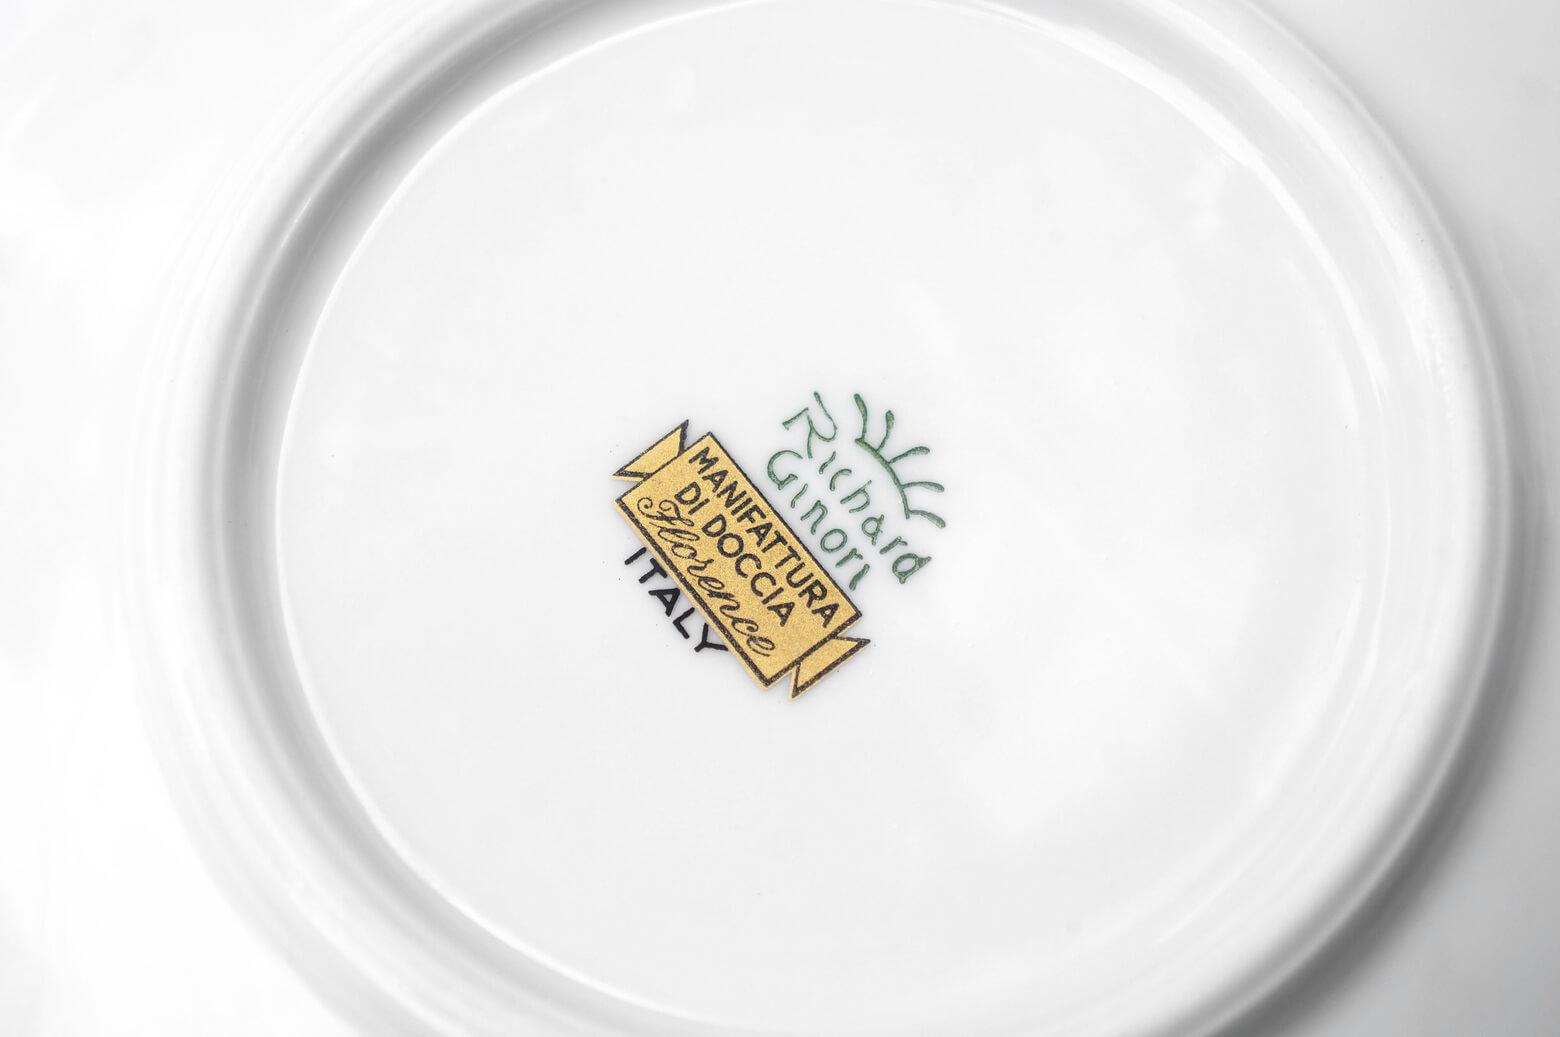 Richard Ginori Impero Giulietta Square Demitas Cup and Saucer/リチャード ジノリ インペロ ジュリエッタ デミタス カップ イタリア 食器 1